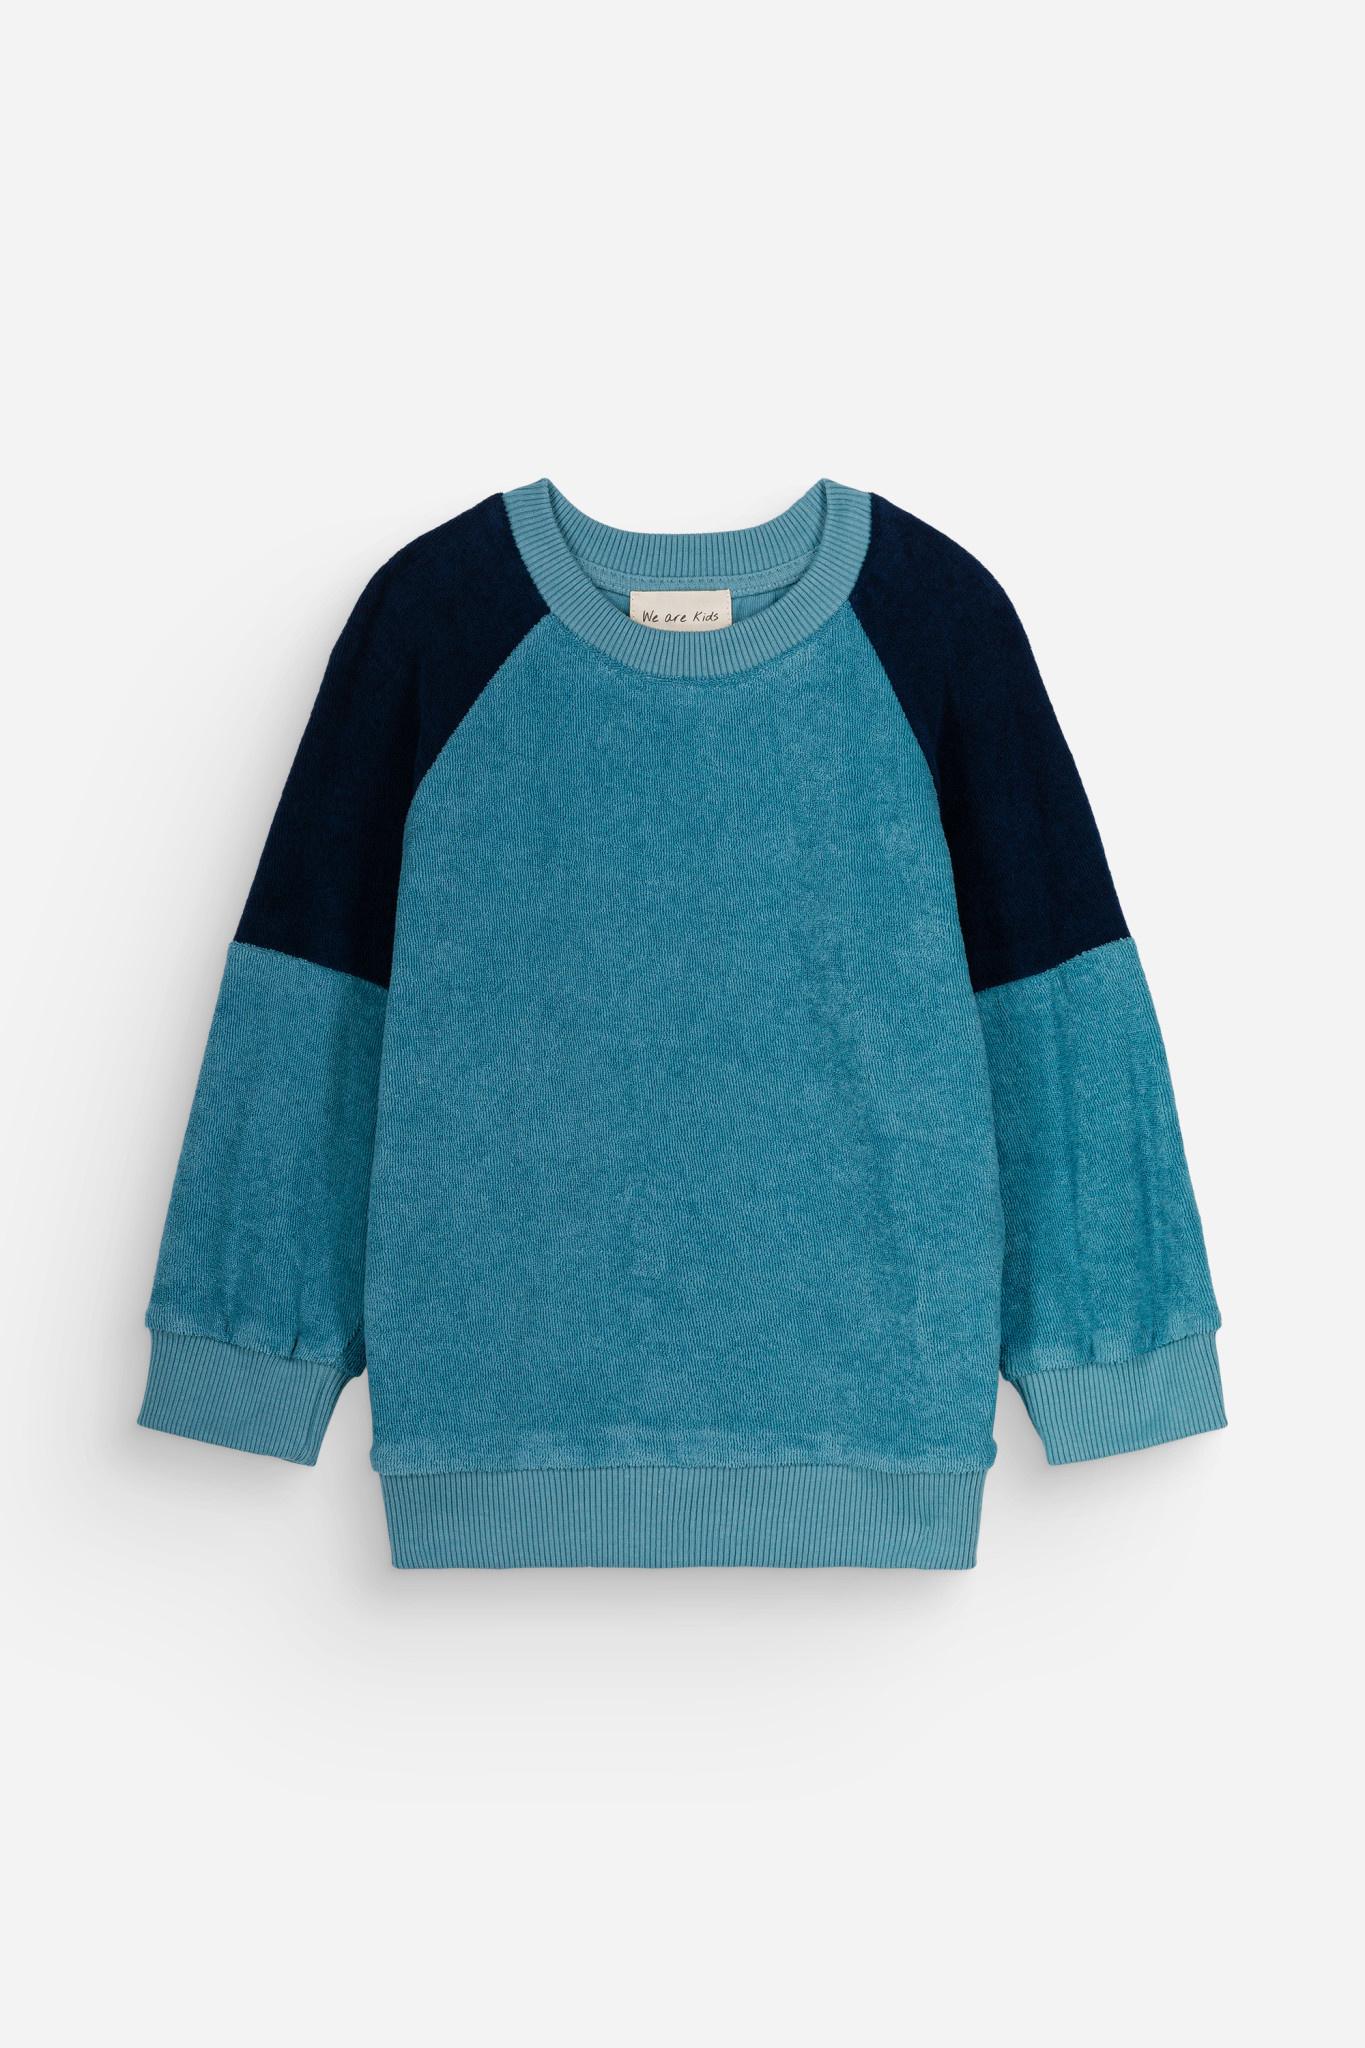 Sweat henri tender blue kids-1